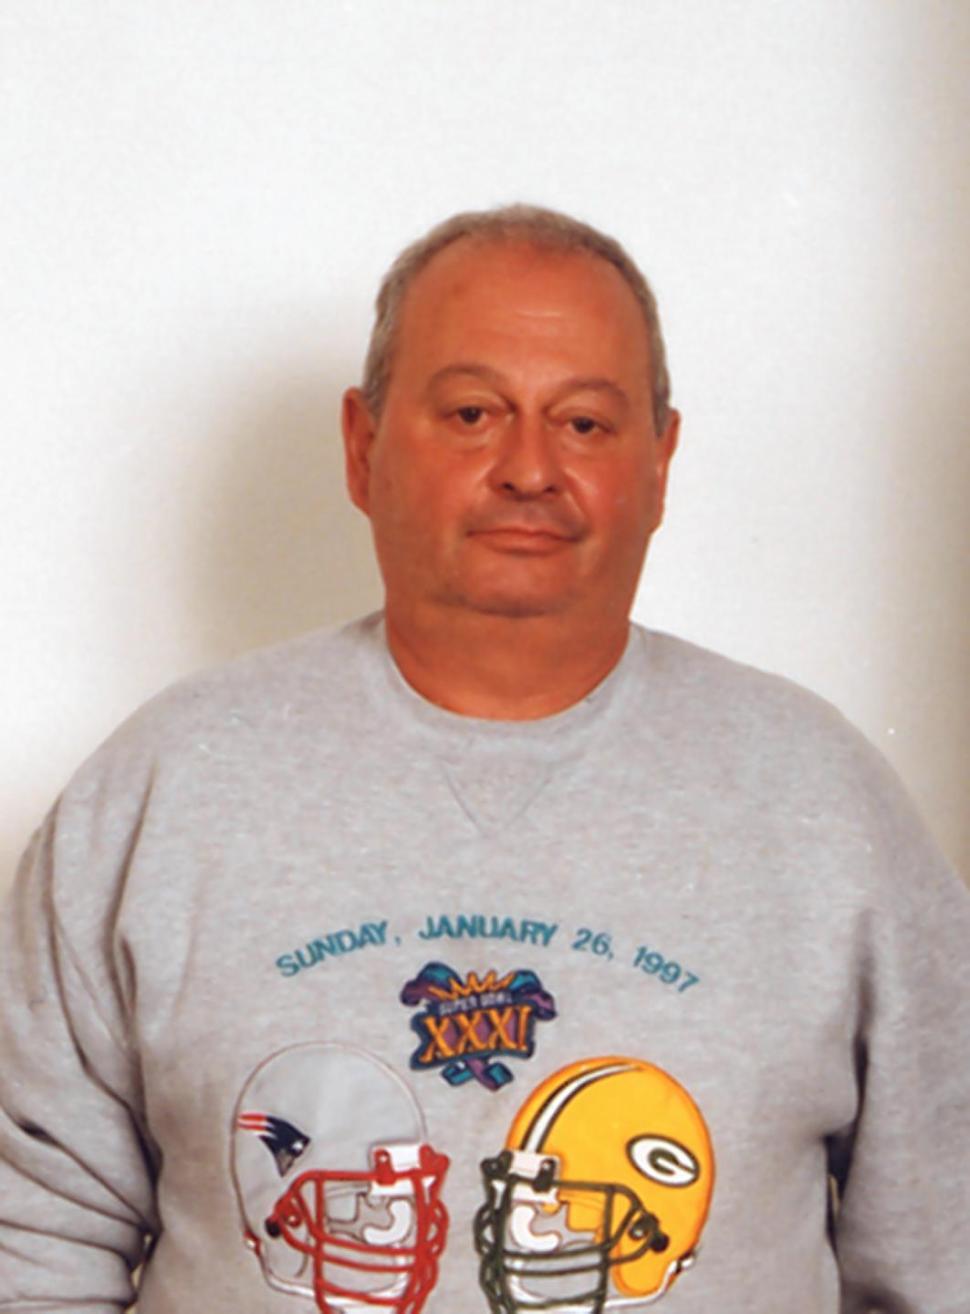 Coppa, Frank J.